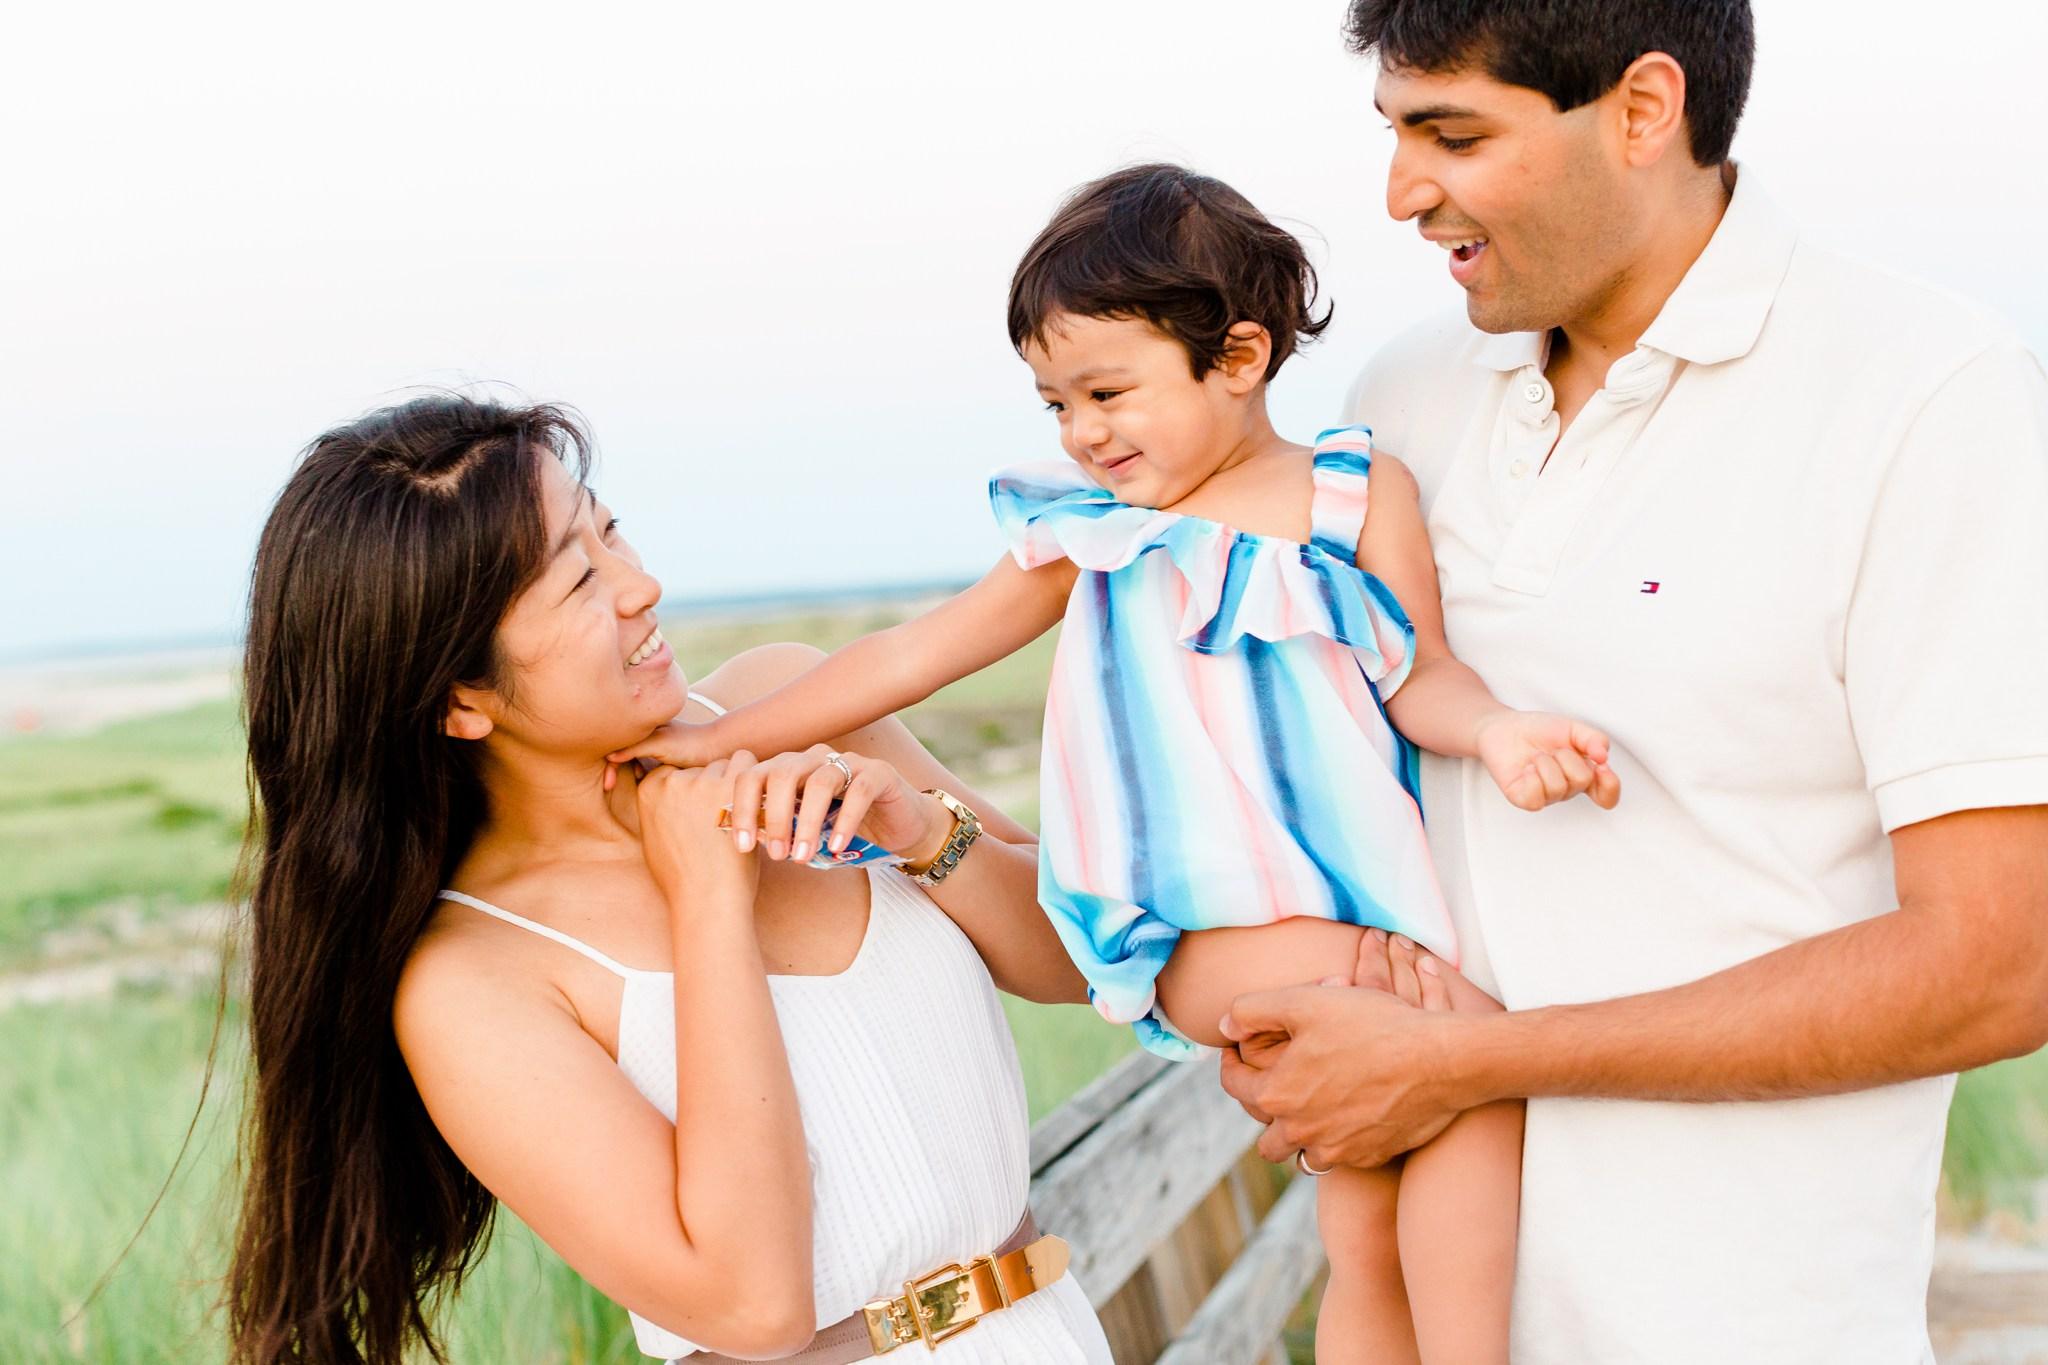 crane_beach_family_portraits_deborah_zoe_00010.JPG